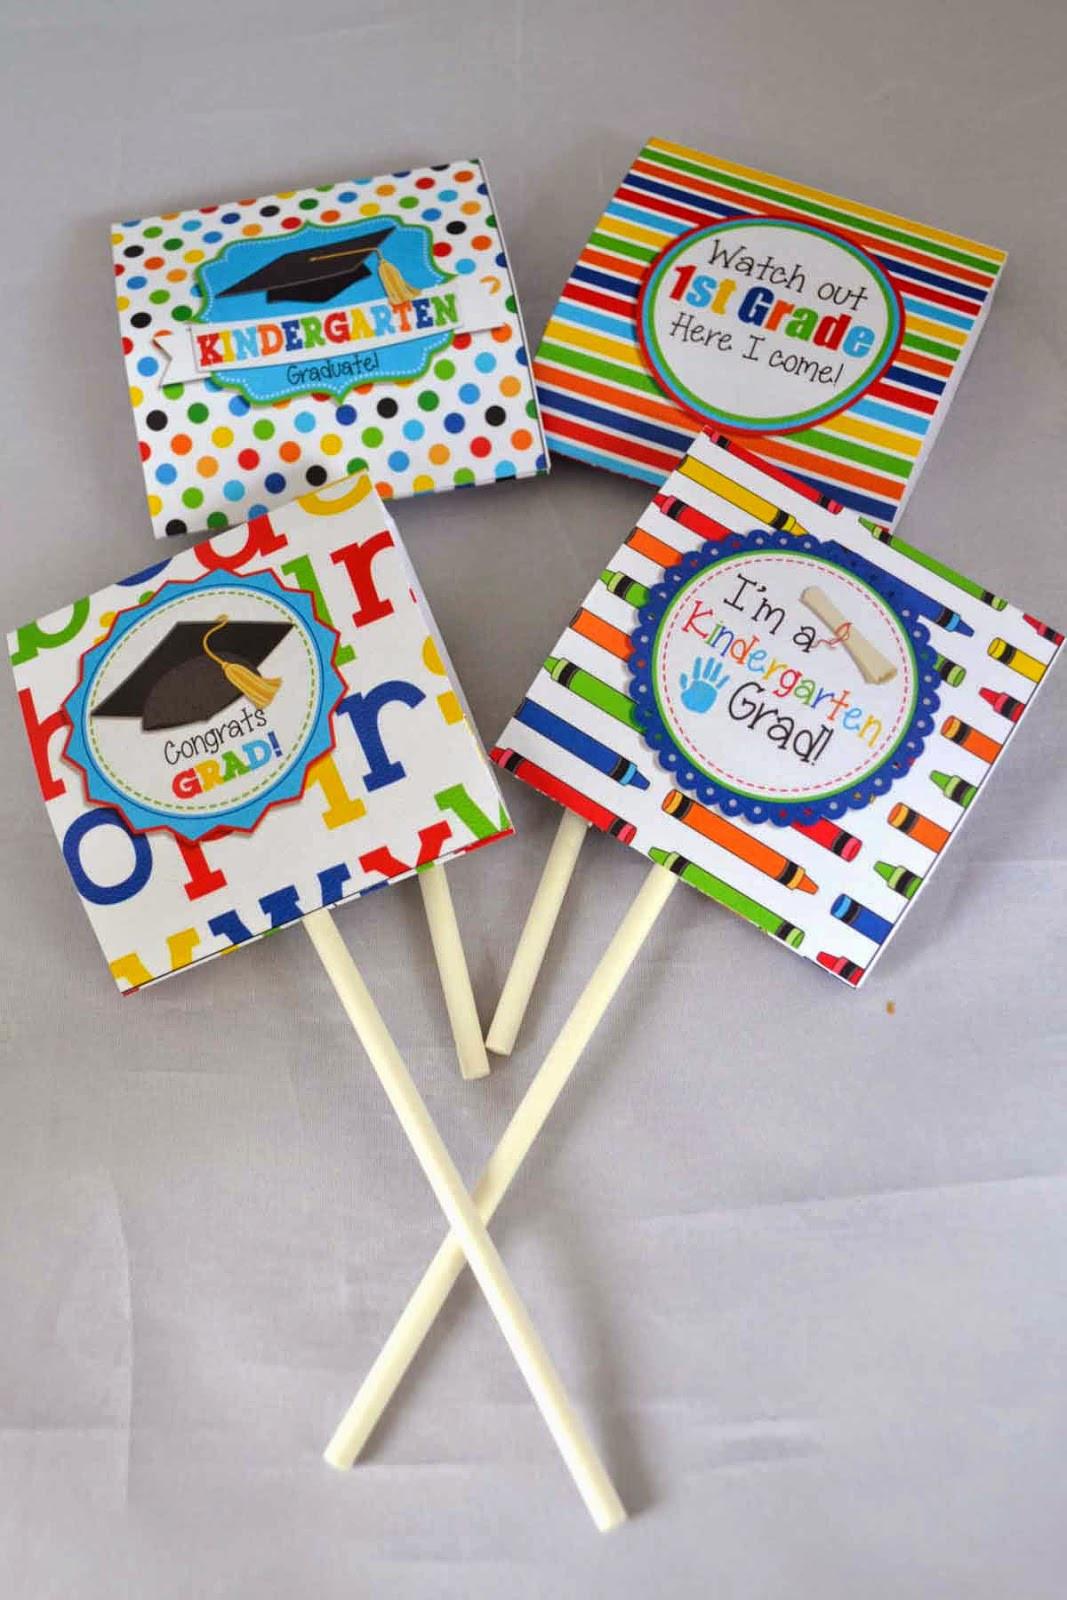 Kindergarten Graduation Gift Ideas  A Manda Creation Kindergarten Graduation Party Printables